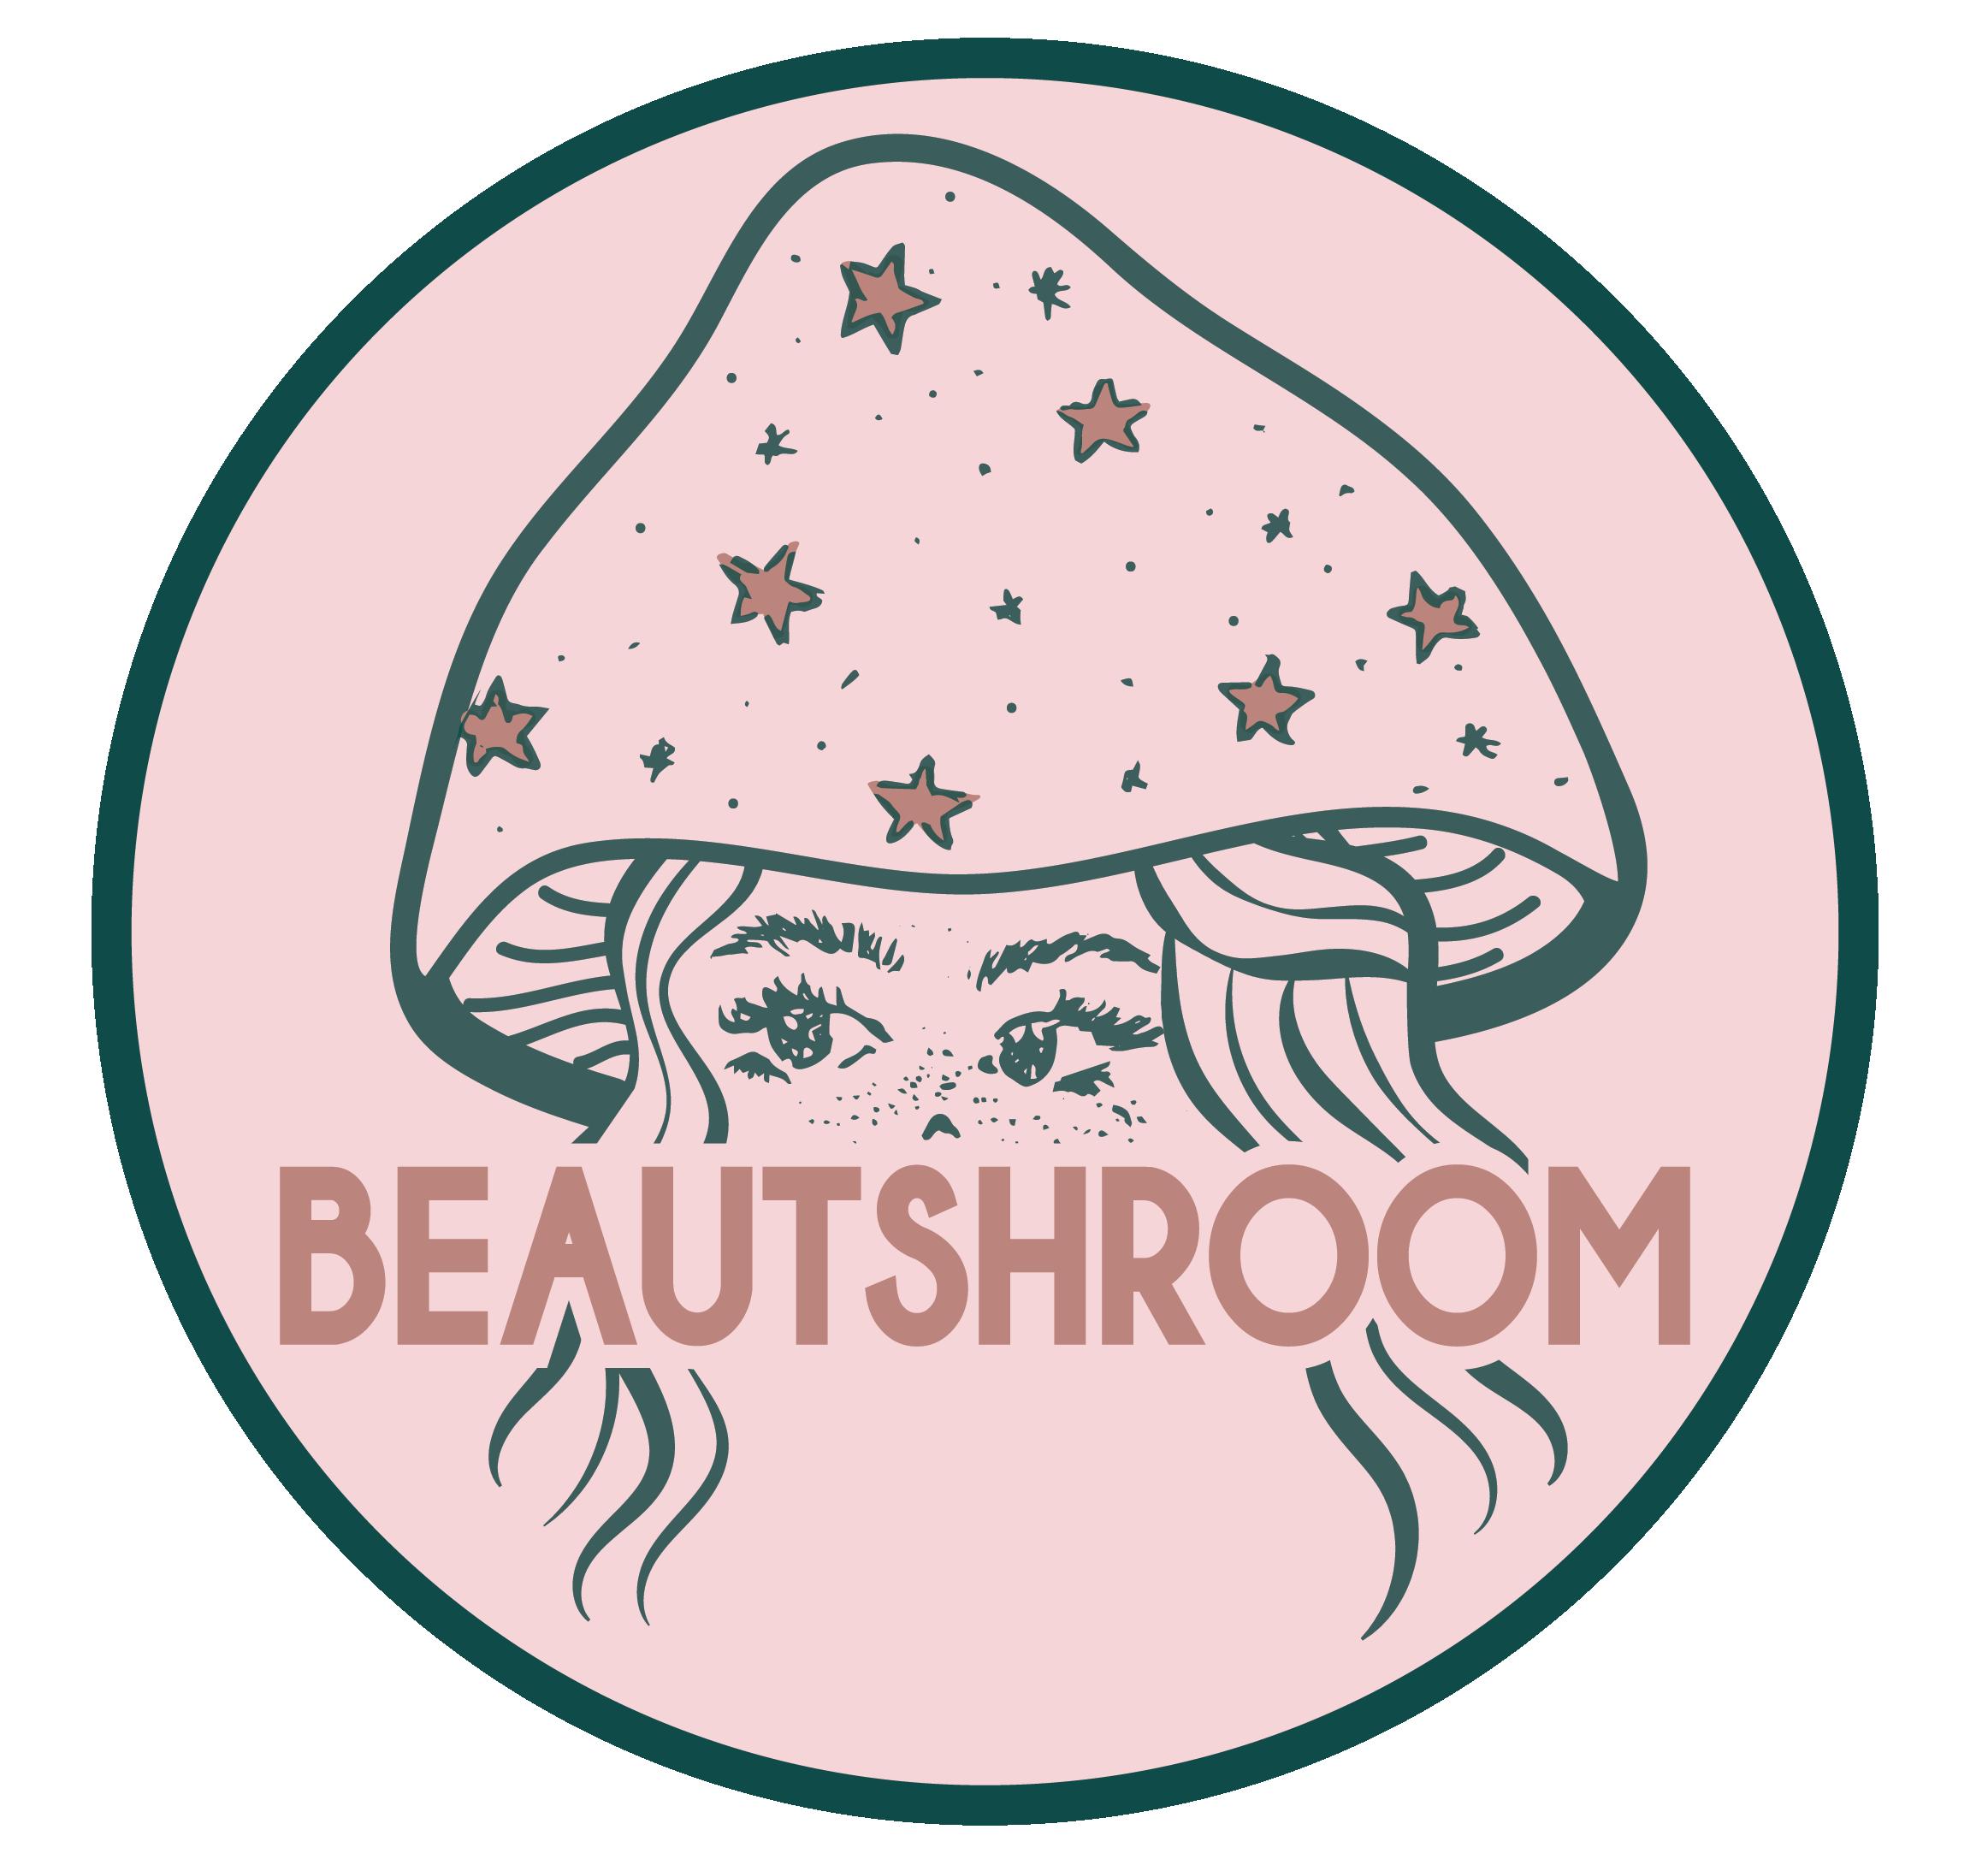 logo by Sara Plank